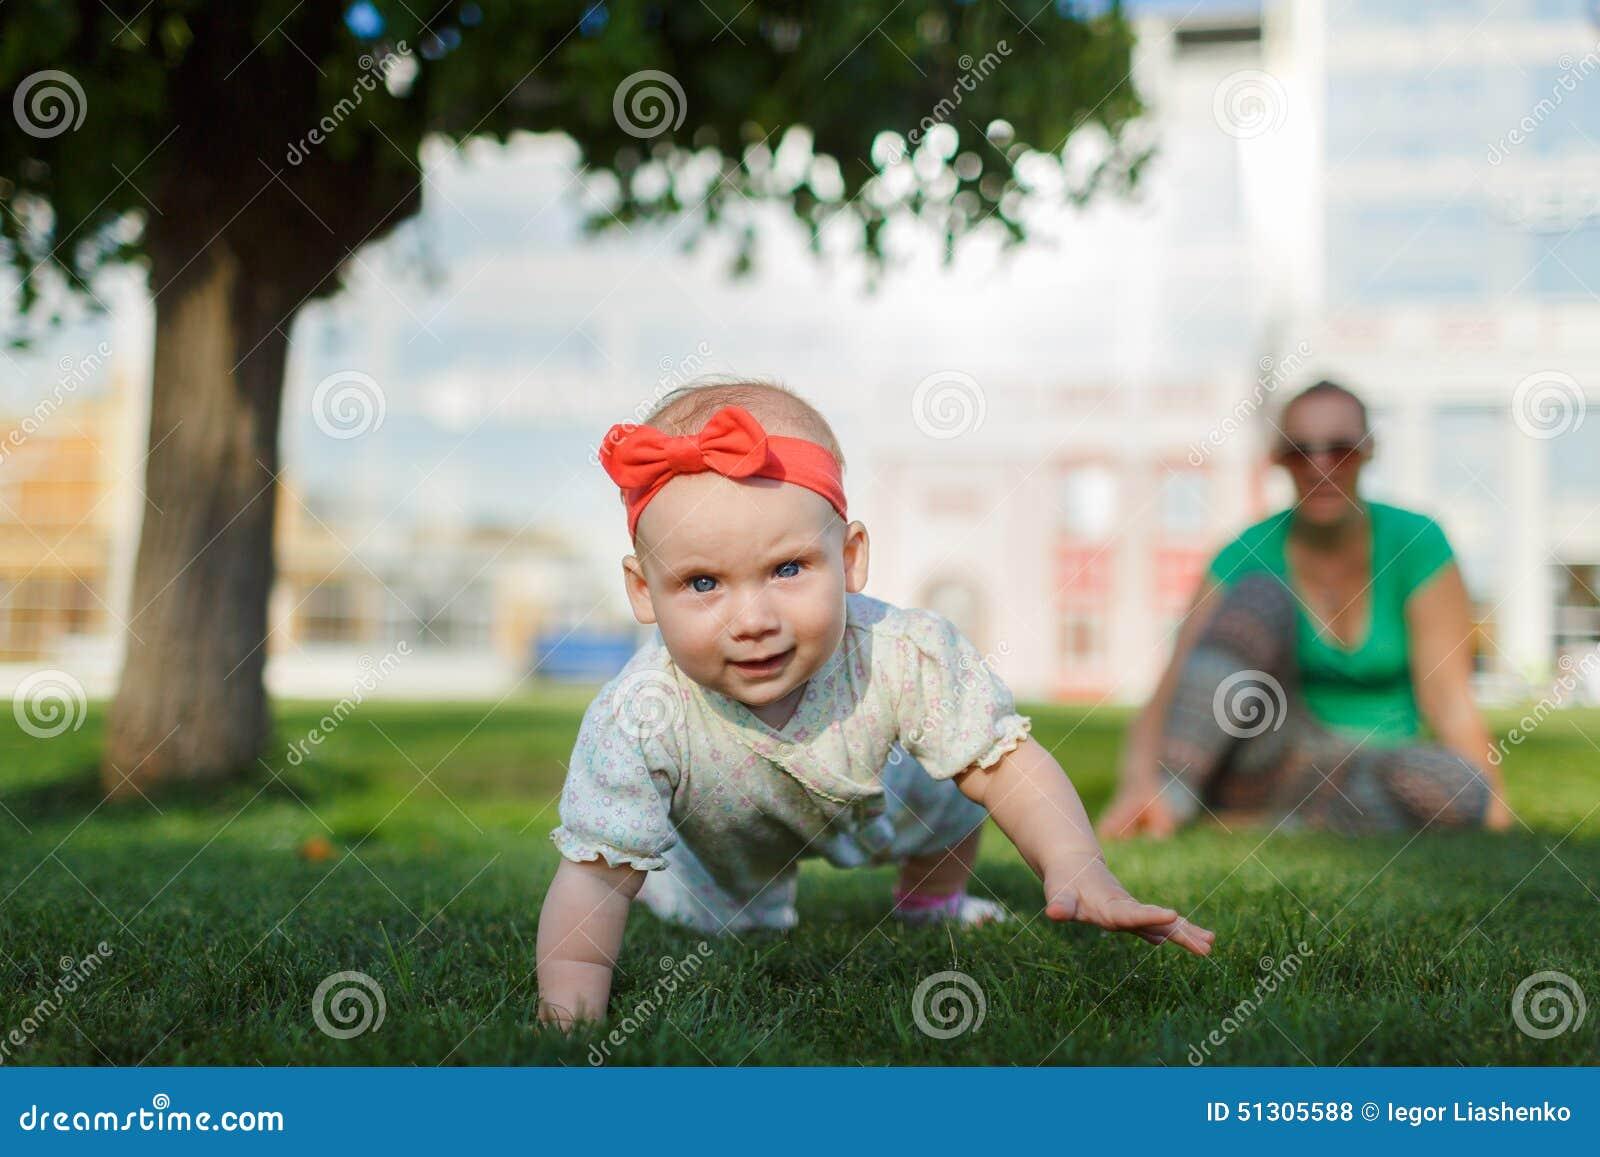 Child Running Away From Mom